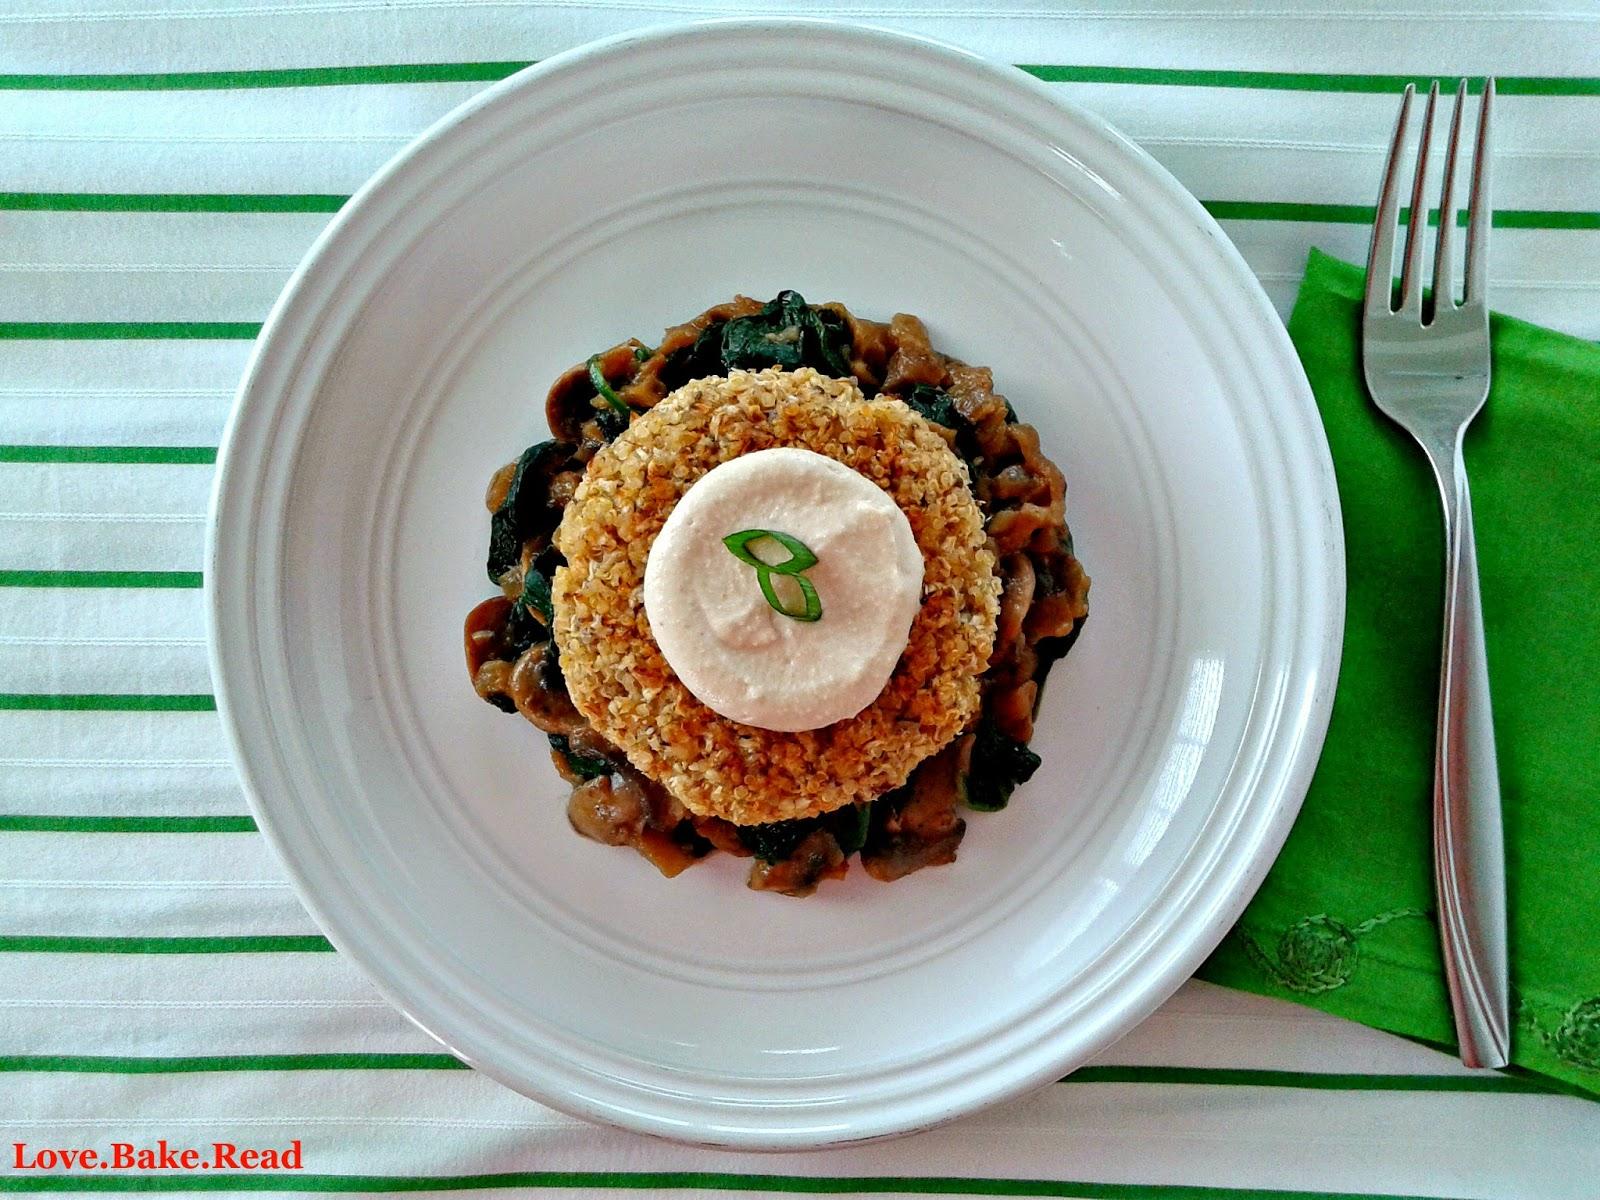 Cauliflower-Quinoa Cakes with Creamy Mushrooms, Spinach, & Caramelized Onions     Love.Bake.Read